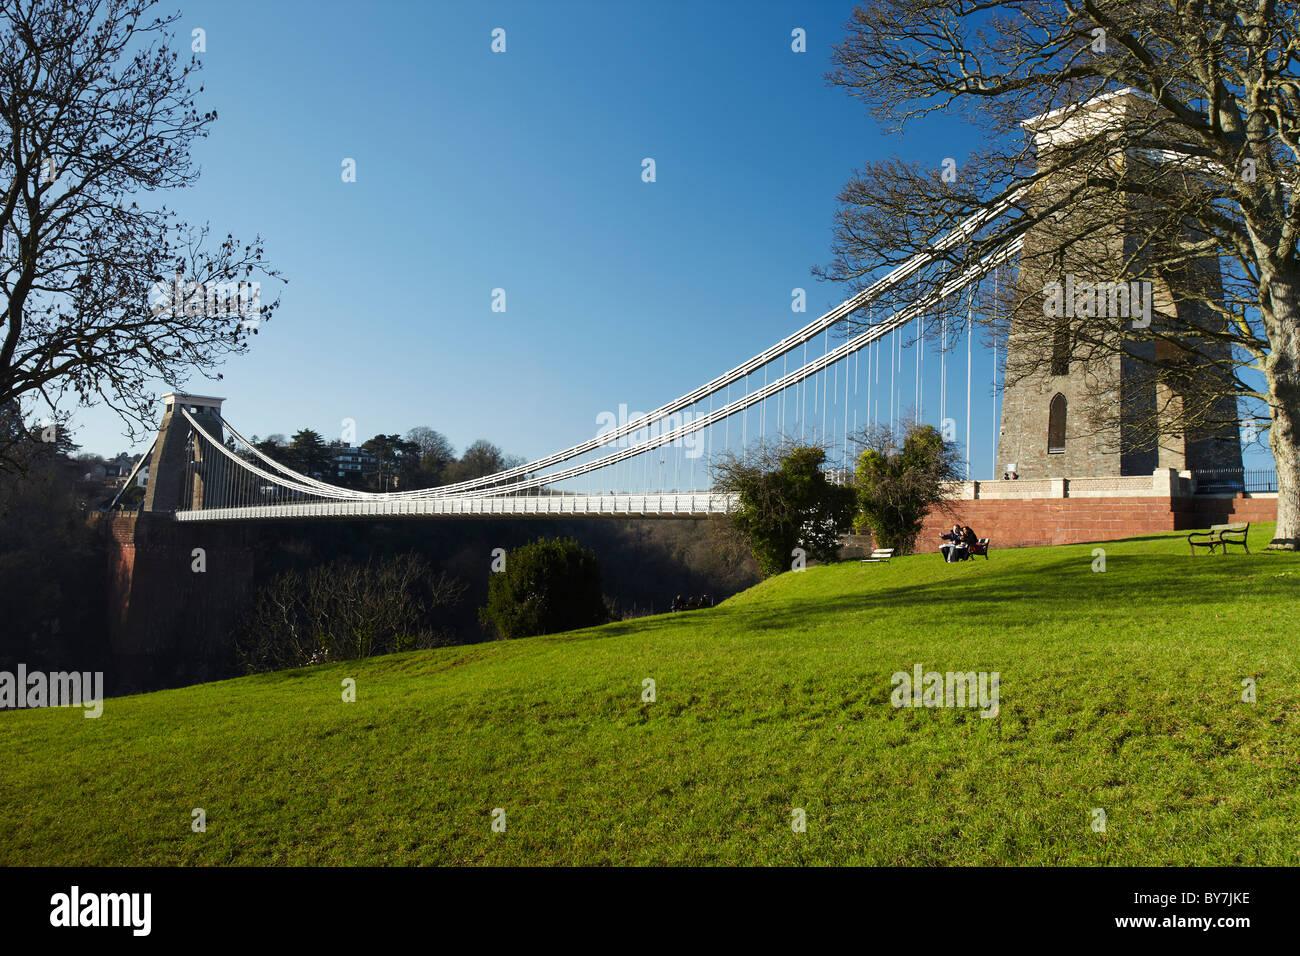 Clifton Suspension Bridge, Bristol, Avon, England, UK - Stock Image